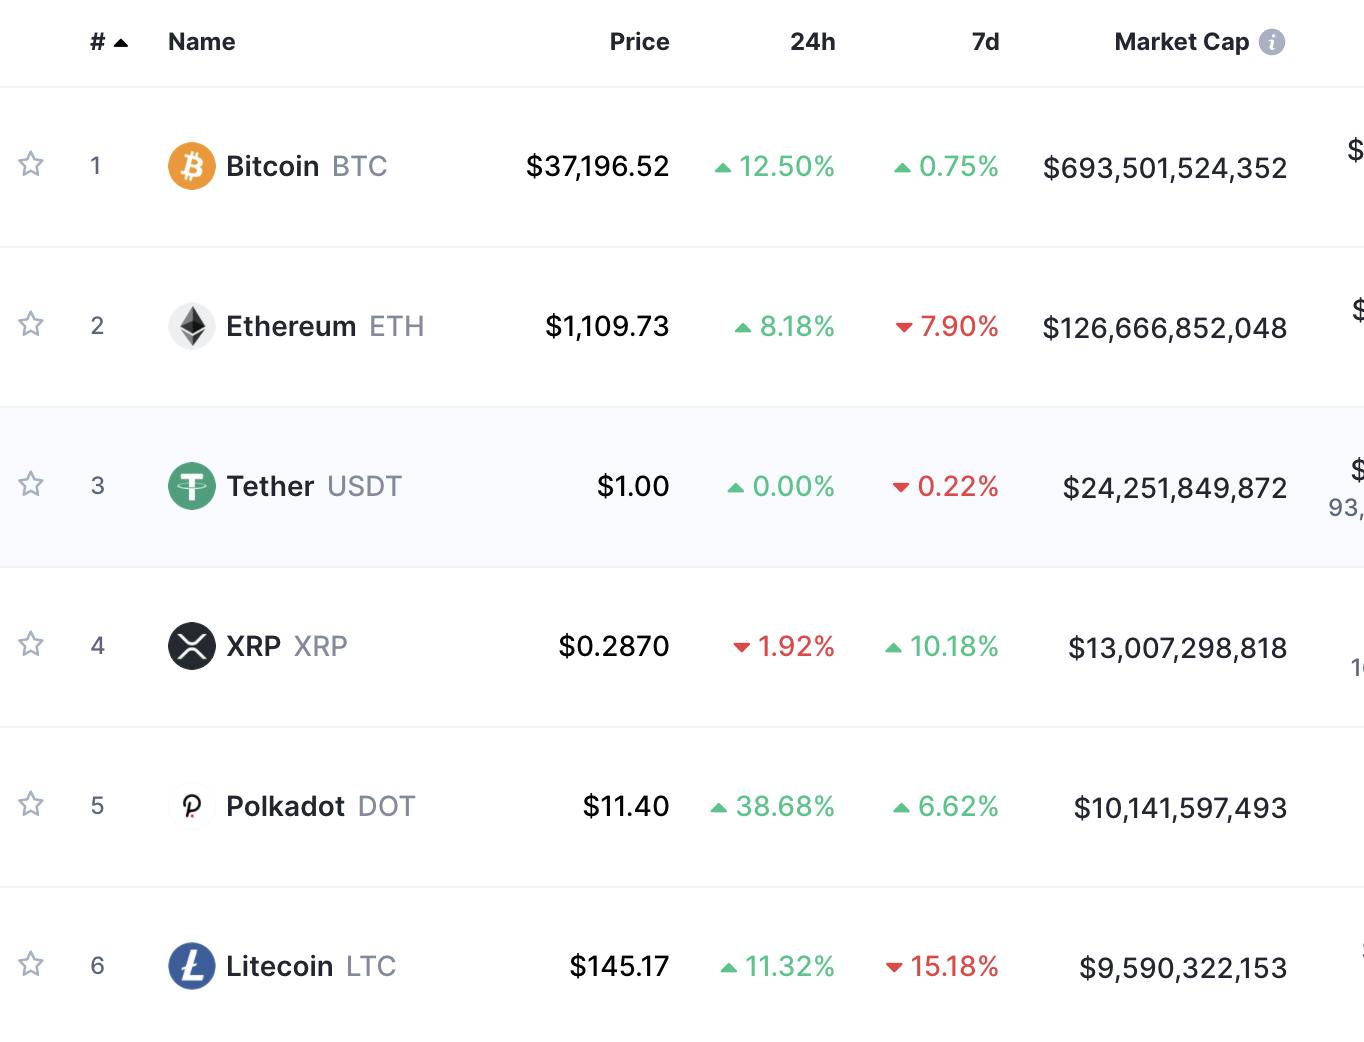 crypto market cap top 6 for January 13, 2020